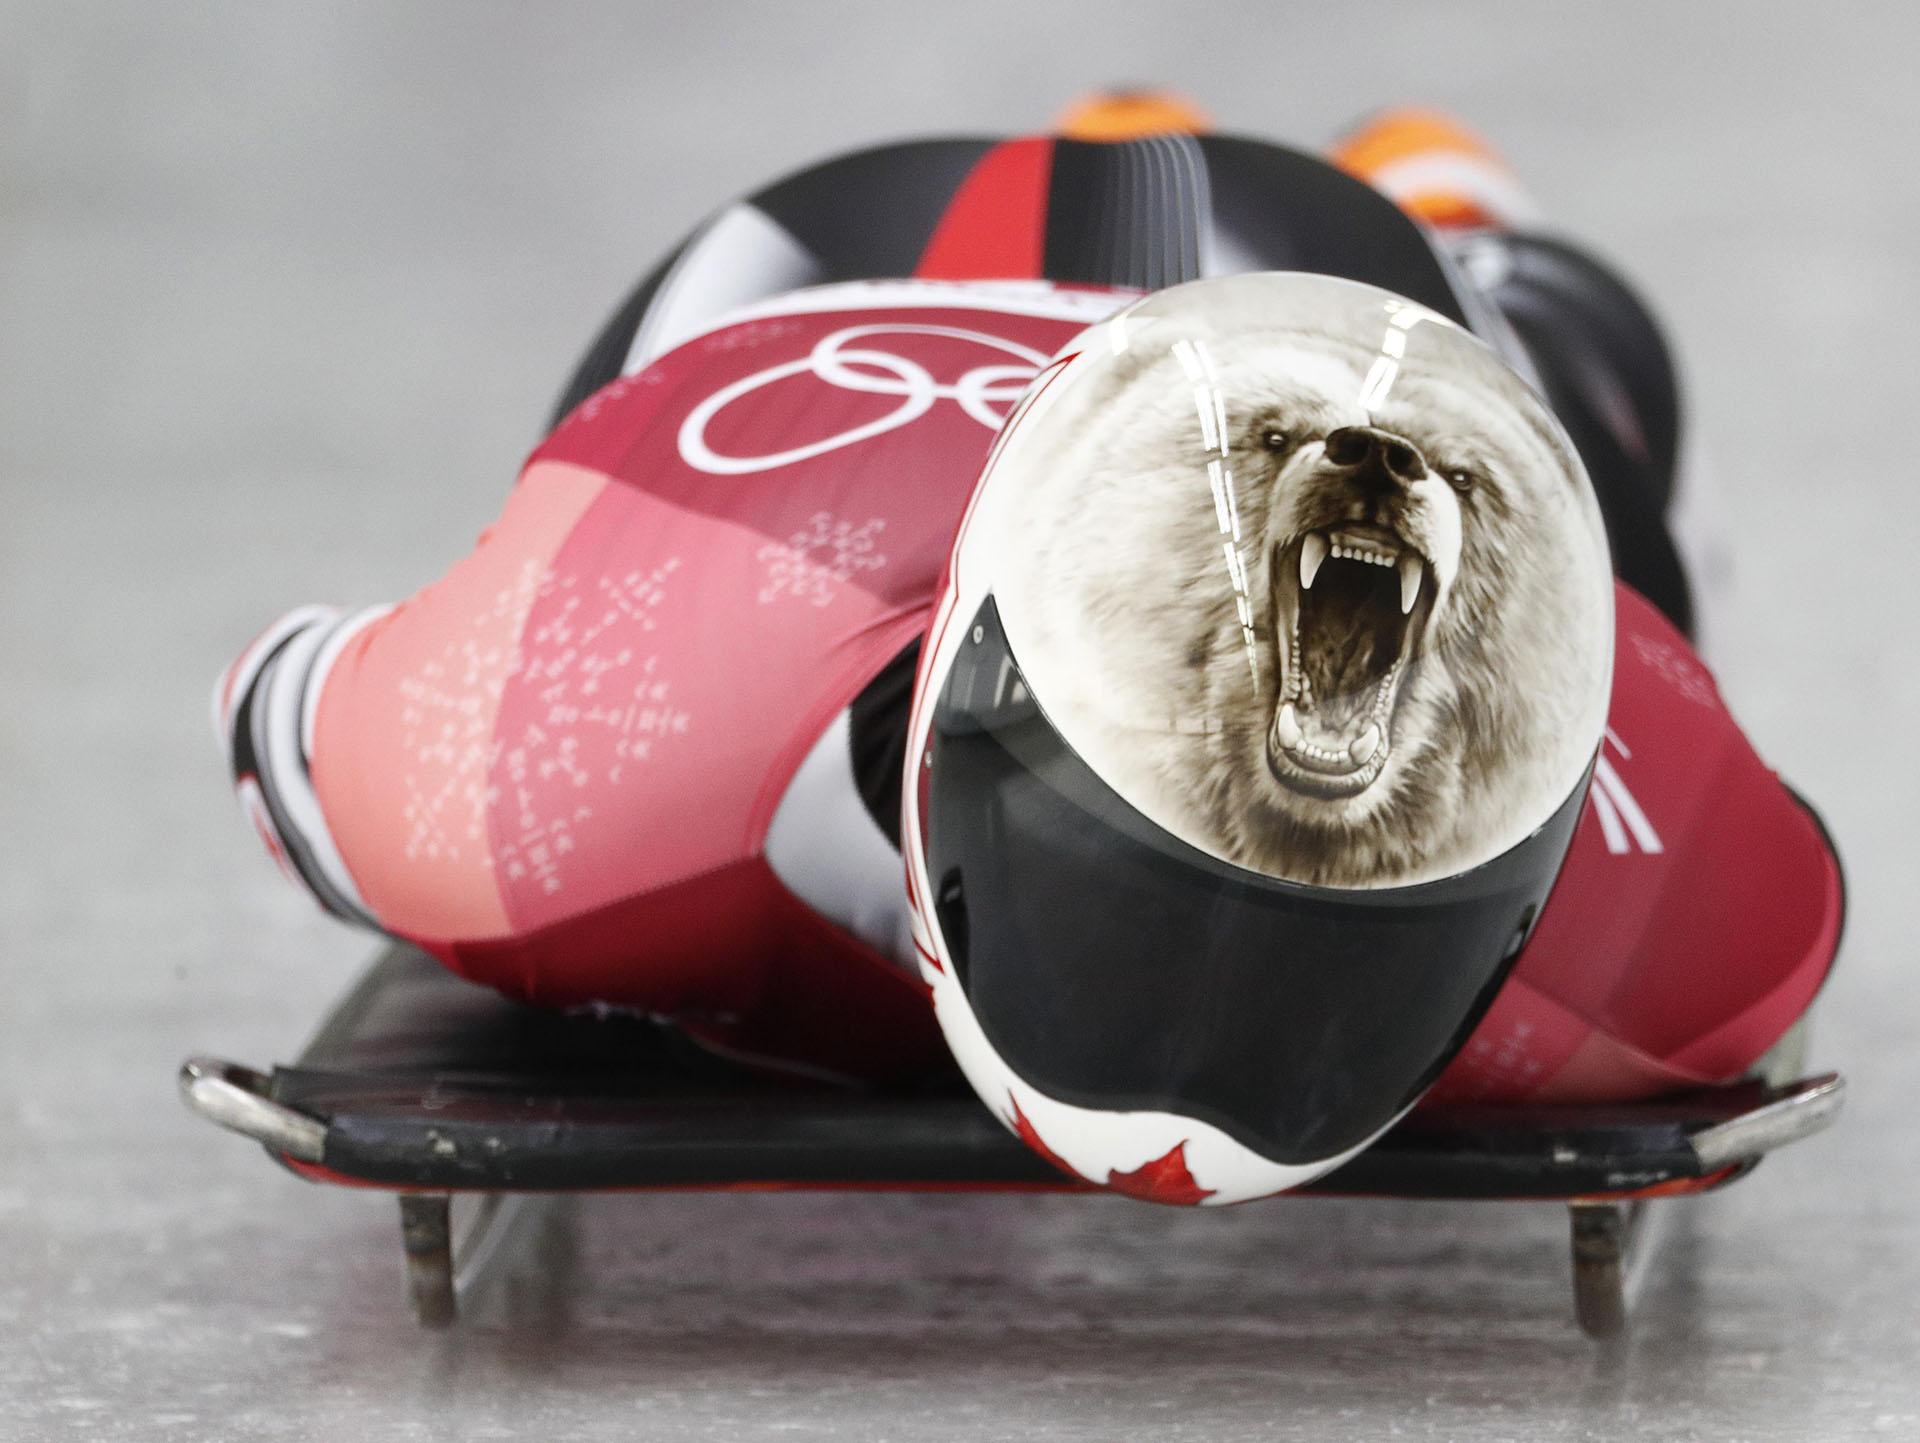 Un oso gruñe desde el casco del canadiense Barrett Martineau